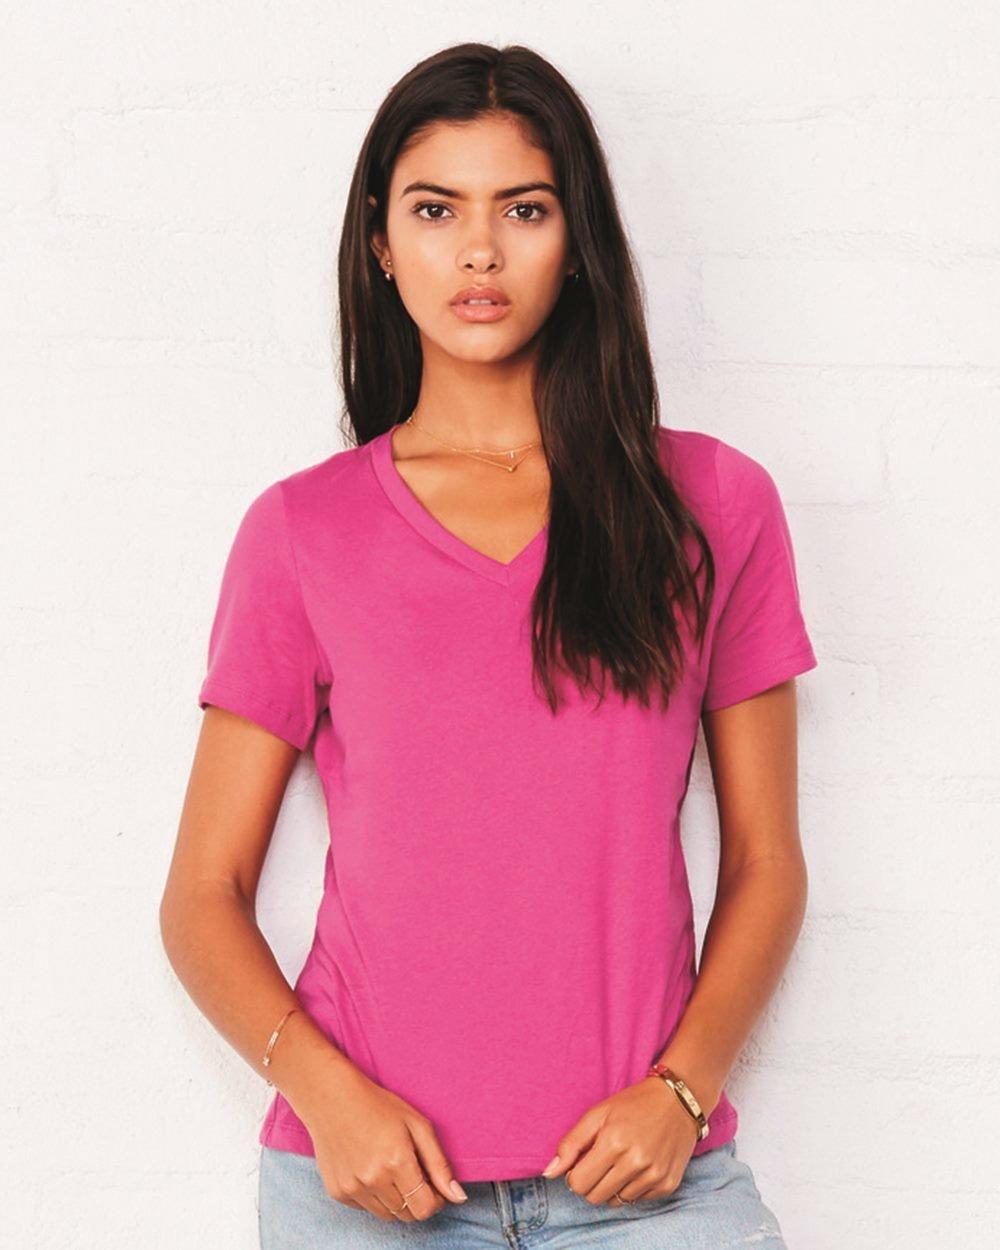 Women's Relaxed Short Sleeve Jersey V-Neck Tee - (STYLE#PRBC006405)